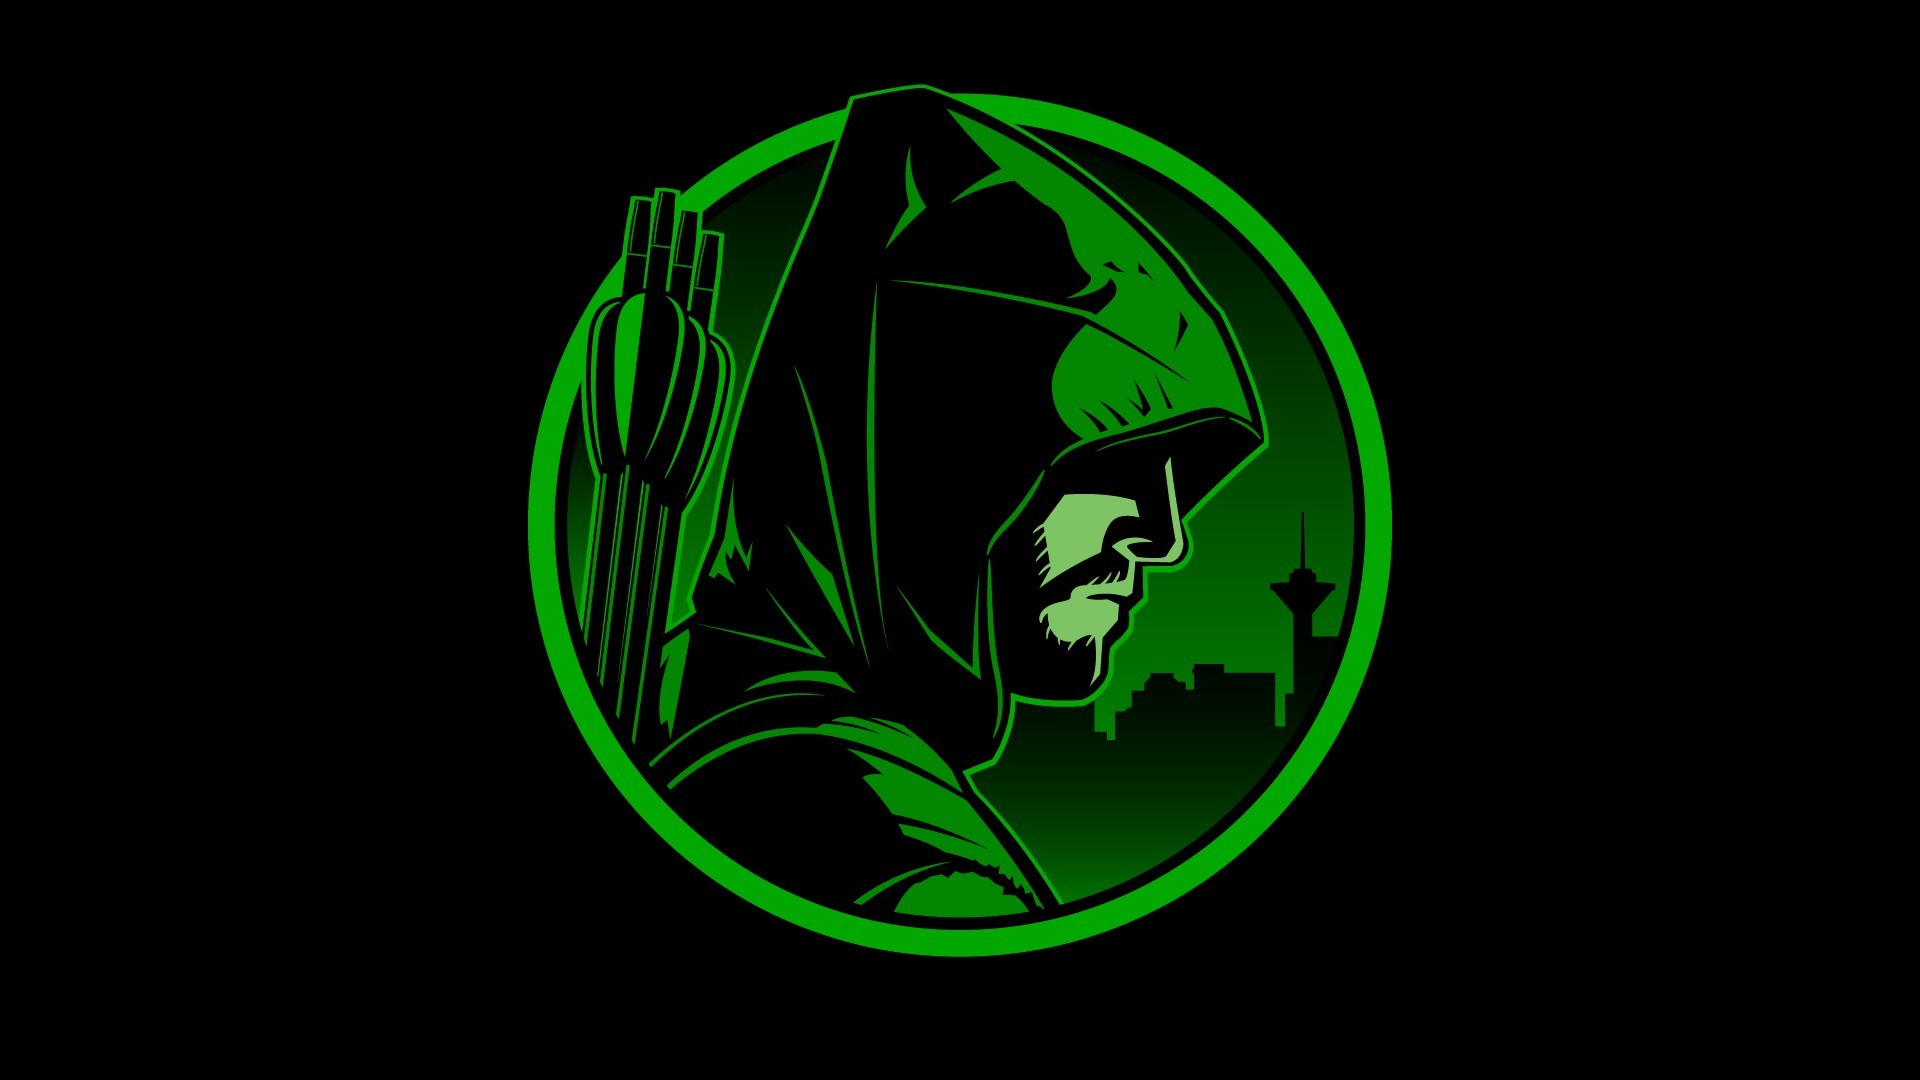 Free download arrow logo wallpapers HD.